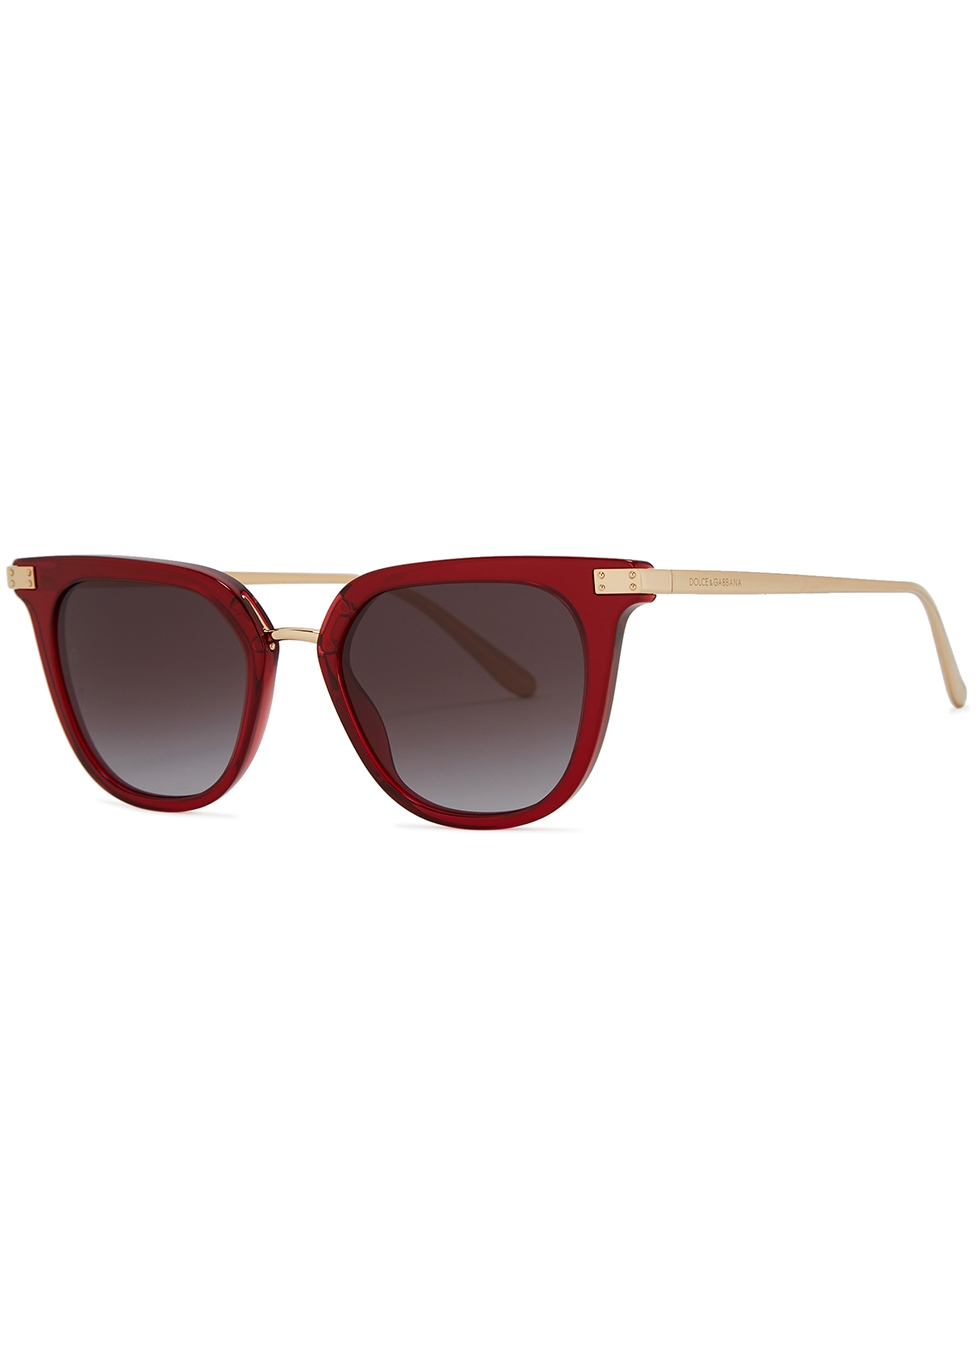 Red oval-frame sunglasses - Dolce & Gabbana